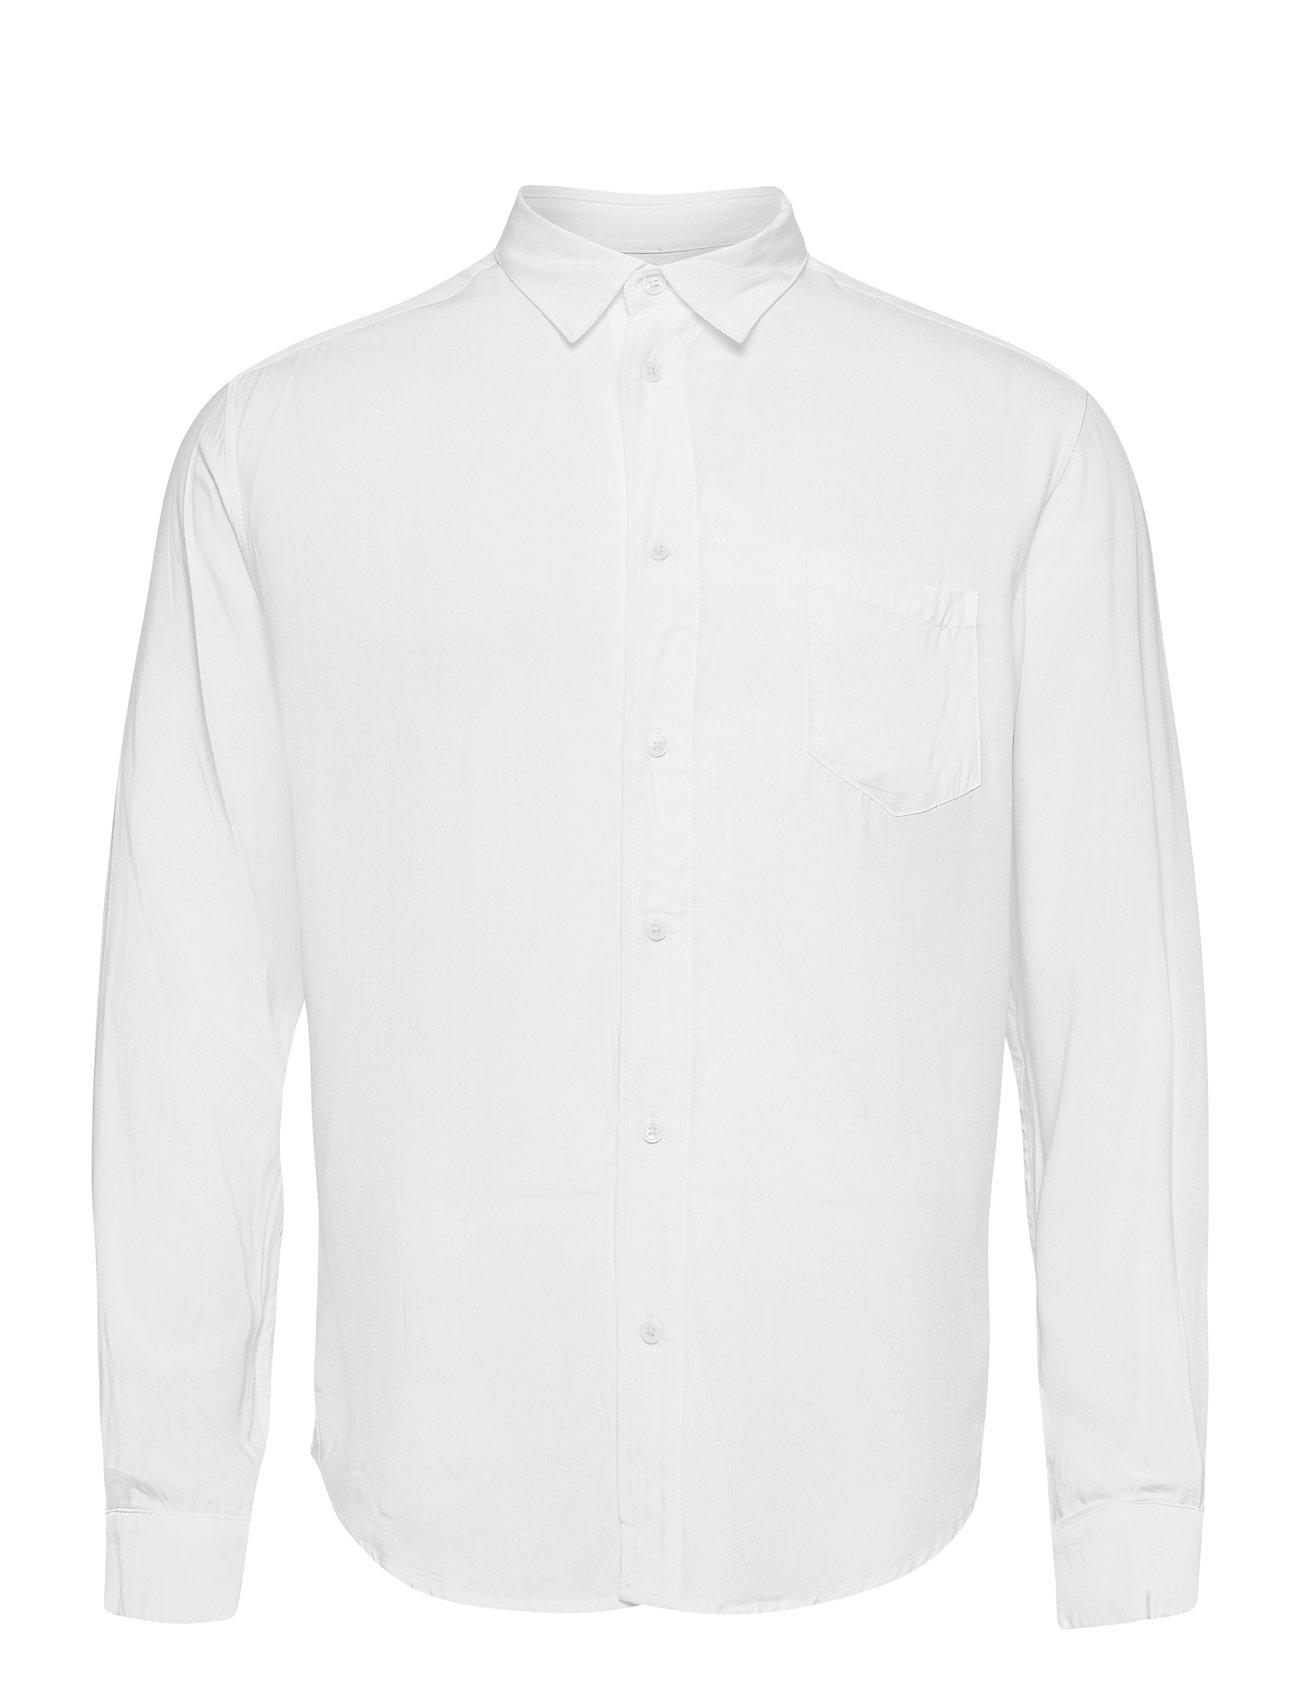 Image of ResteröDs Regular Shirt Skjorte Casual Hvid Resteröds (3445311951)